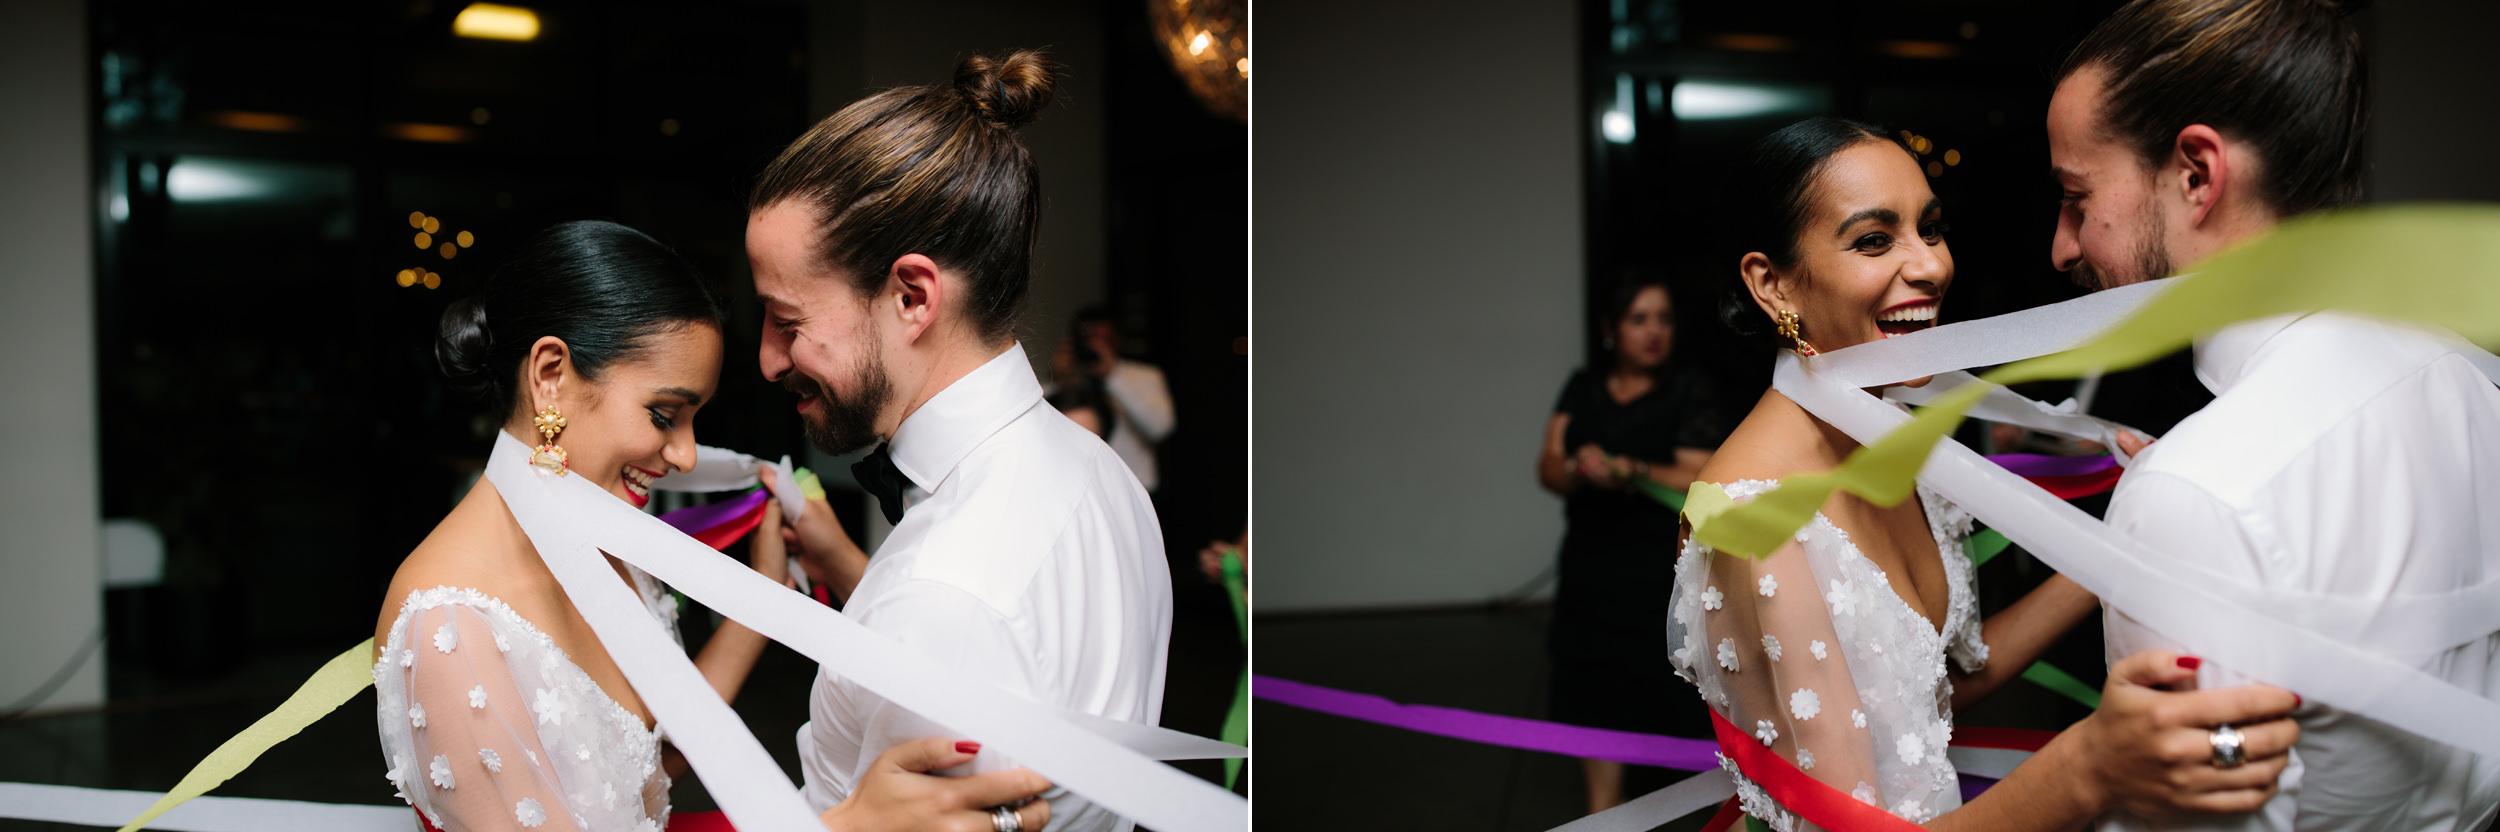 I-Got-You-Babe-Weddings-Tevany-Adam0170.JPG